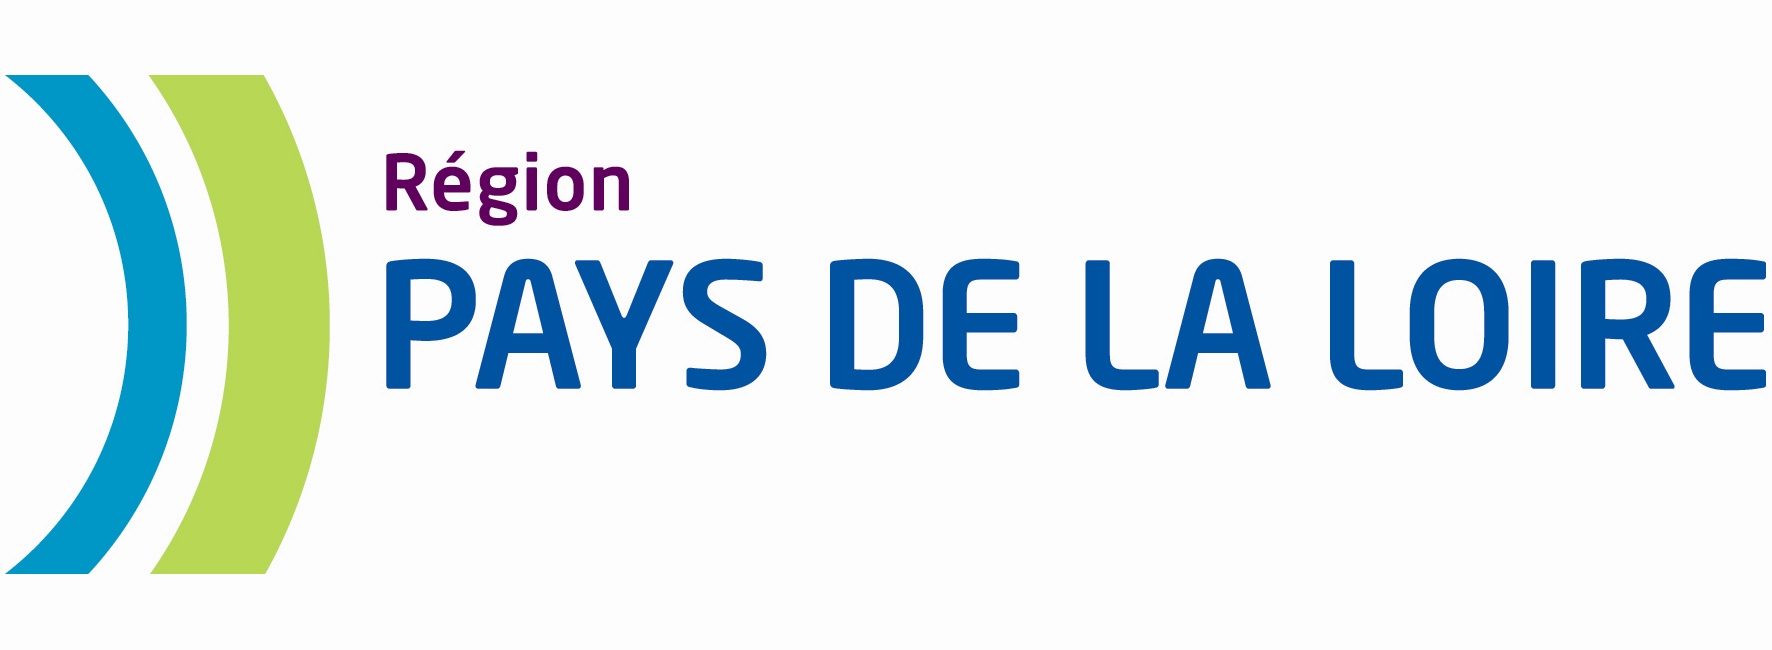 Region_Pays_de_la_Loire